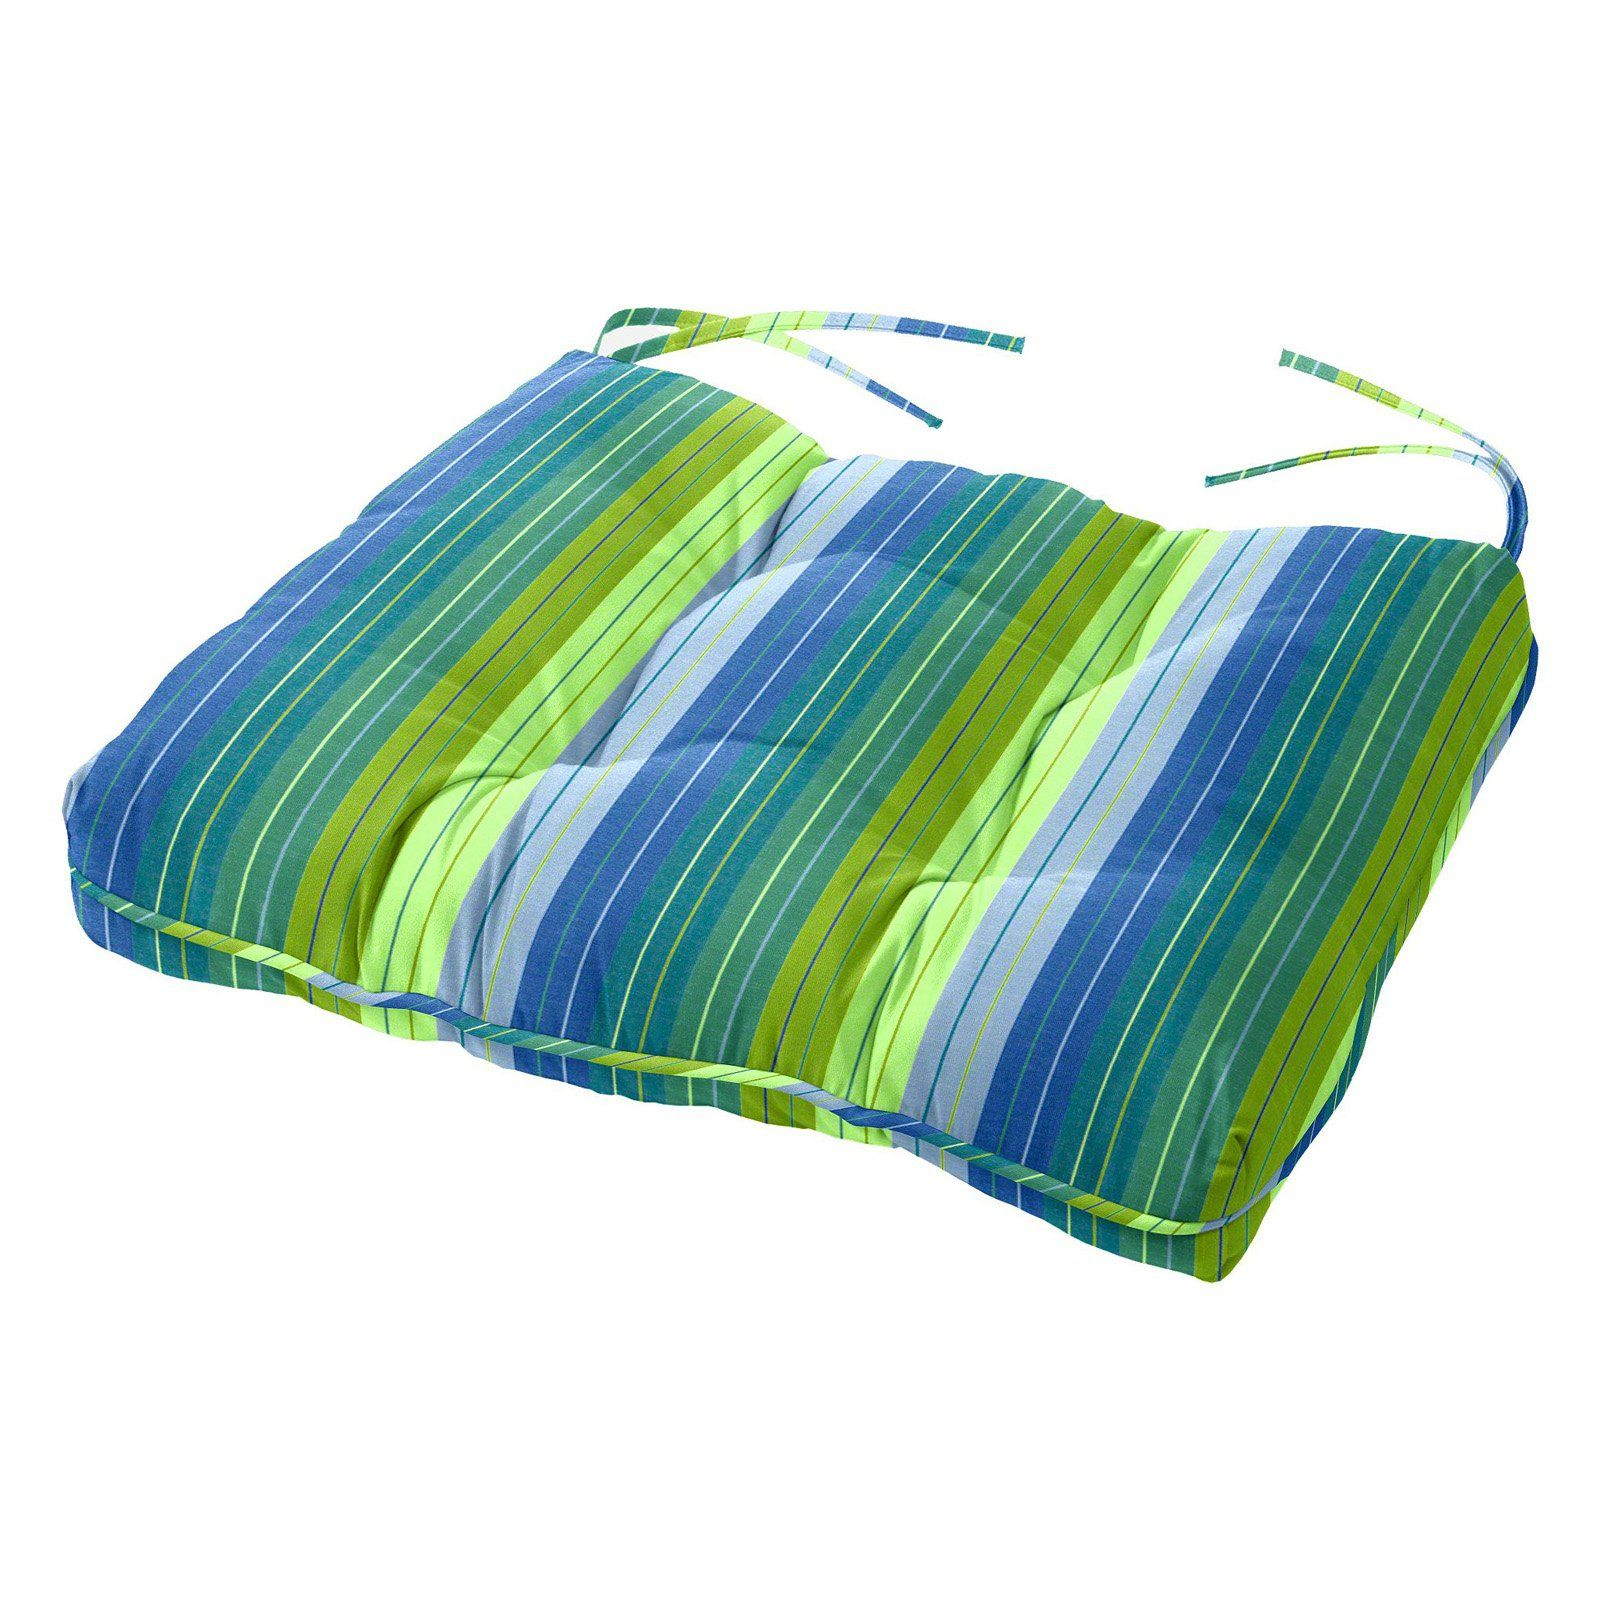 Cushion Source 24 5 X 20 In Striped Sunbrella Chair Cushion In 2019